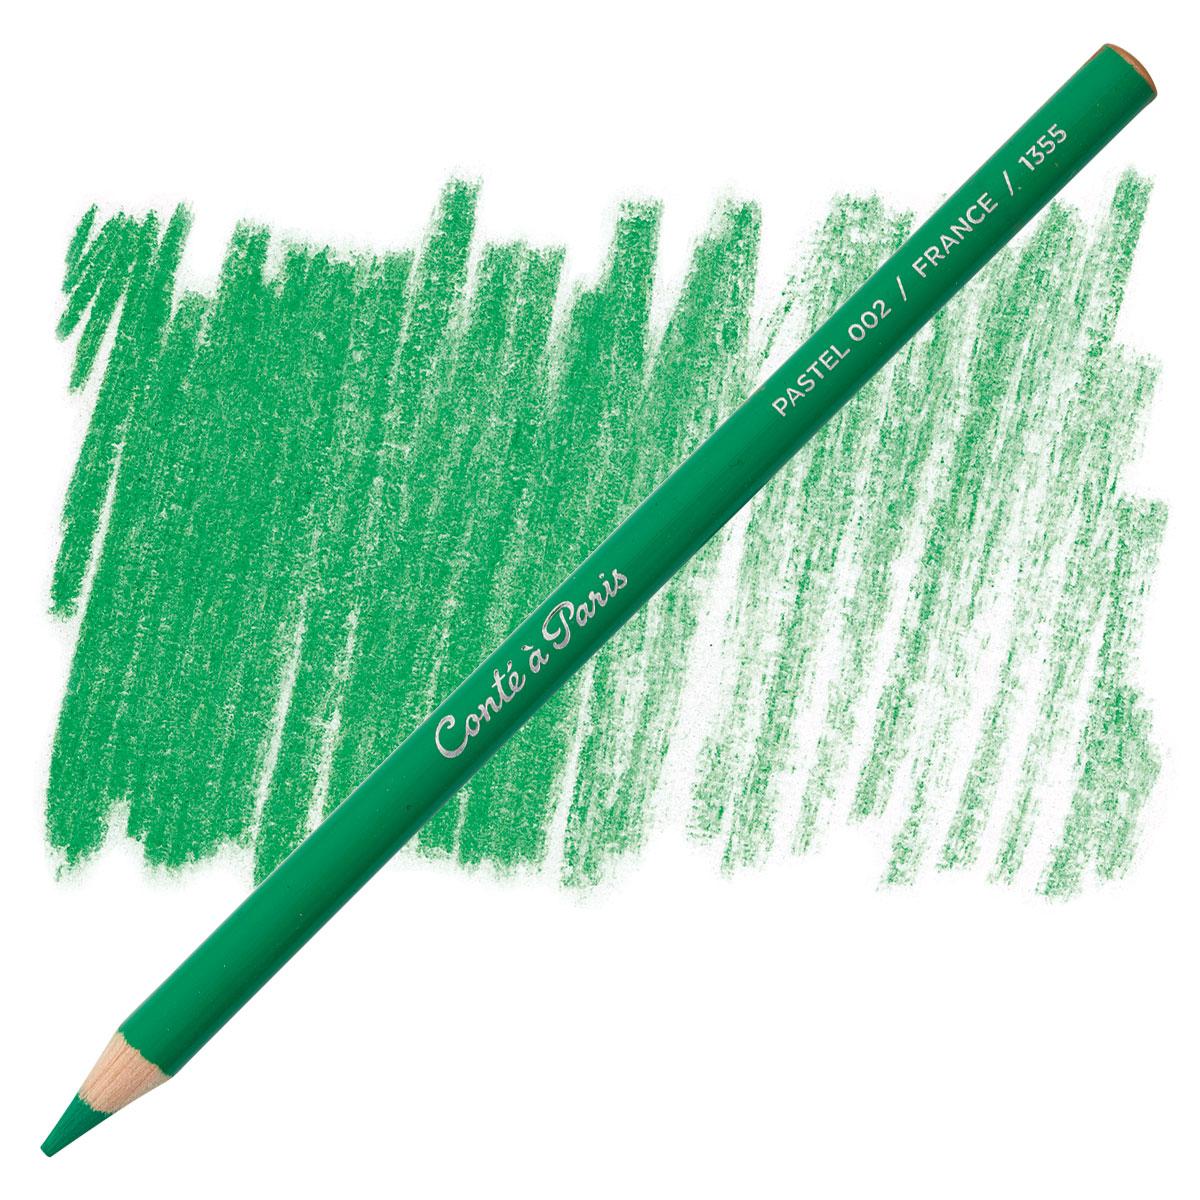 Conte pastel crayon St Michael Green 44